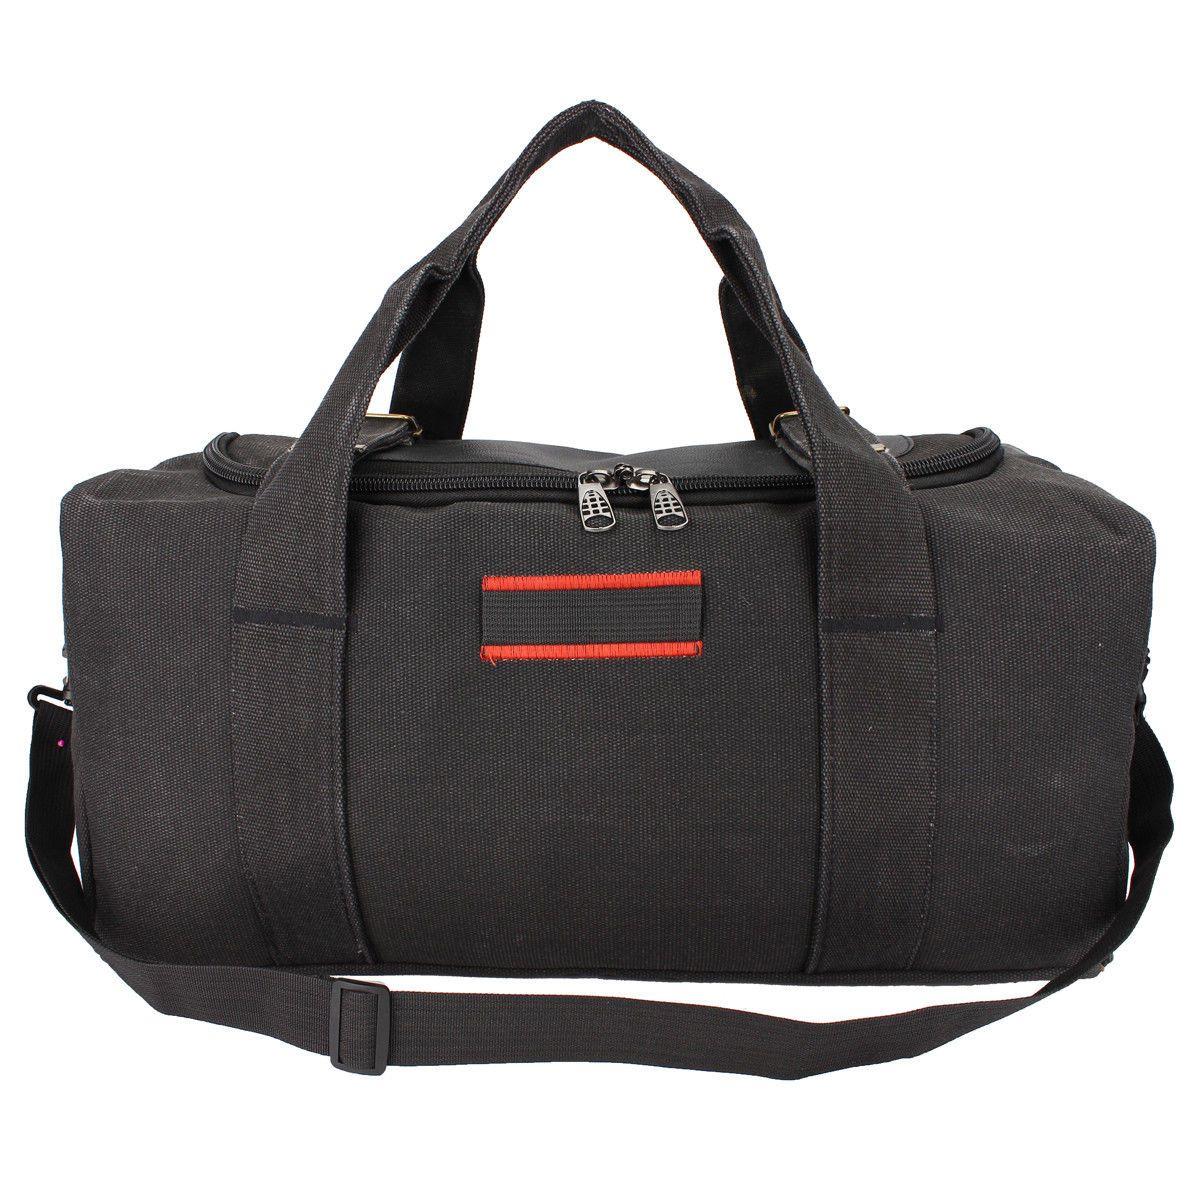 14.69 - Men Military Canvas Gym Duffle Large Shoulder Bag Outdoor Travel  Luggage Handbag  ebay  Fashion 462b8b81b80c5